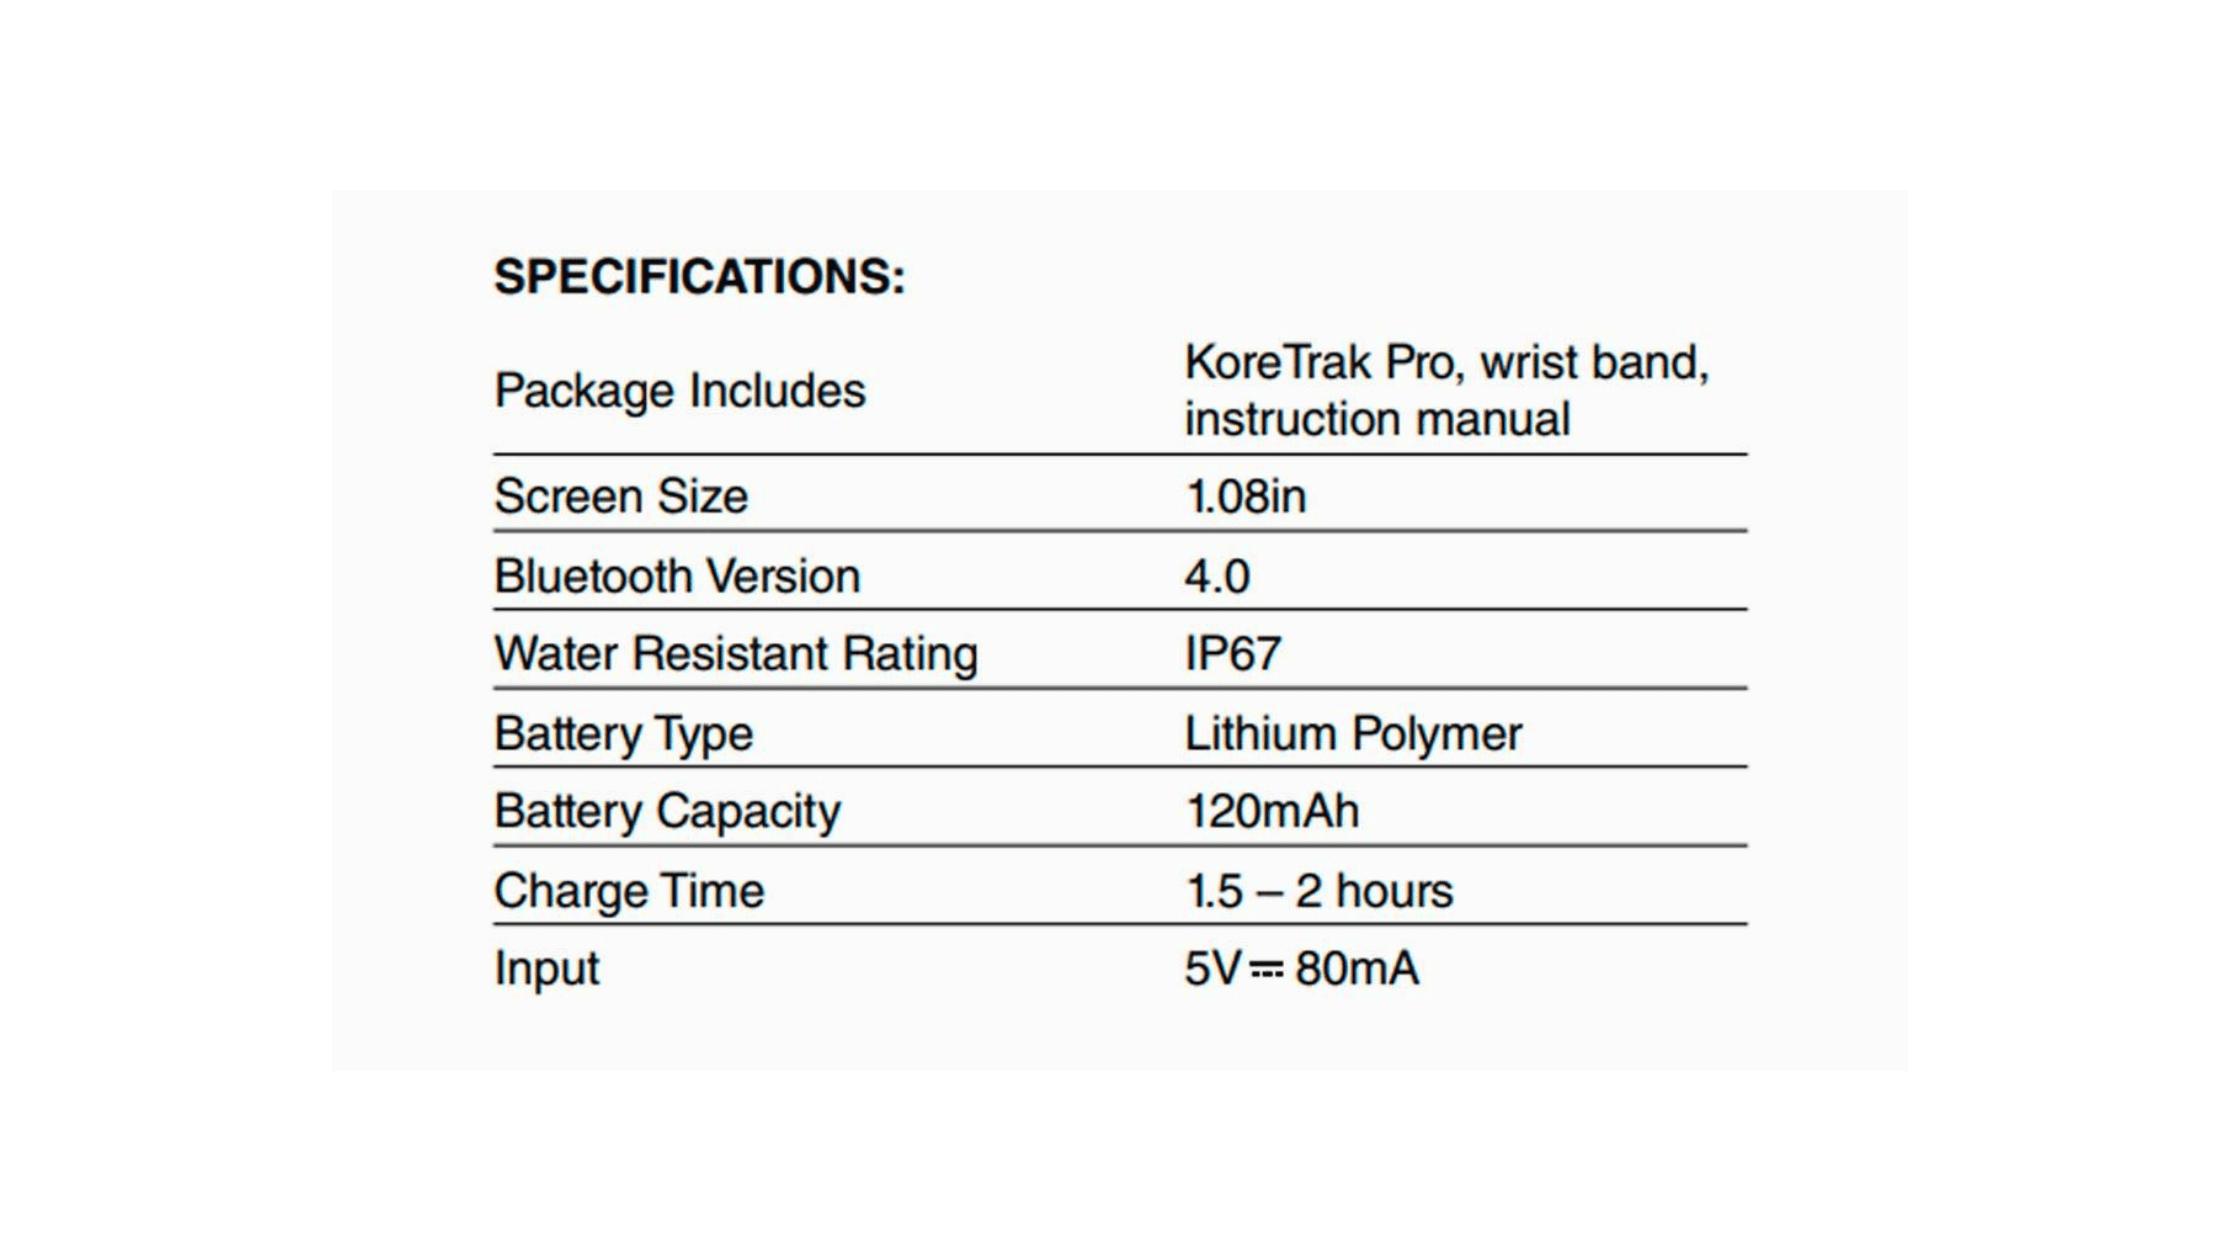 KoreTrak Pro Specifications